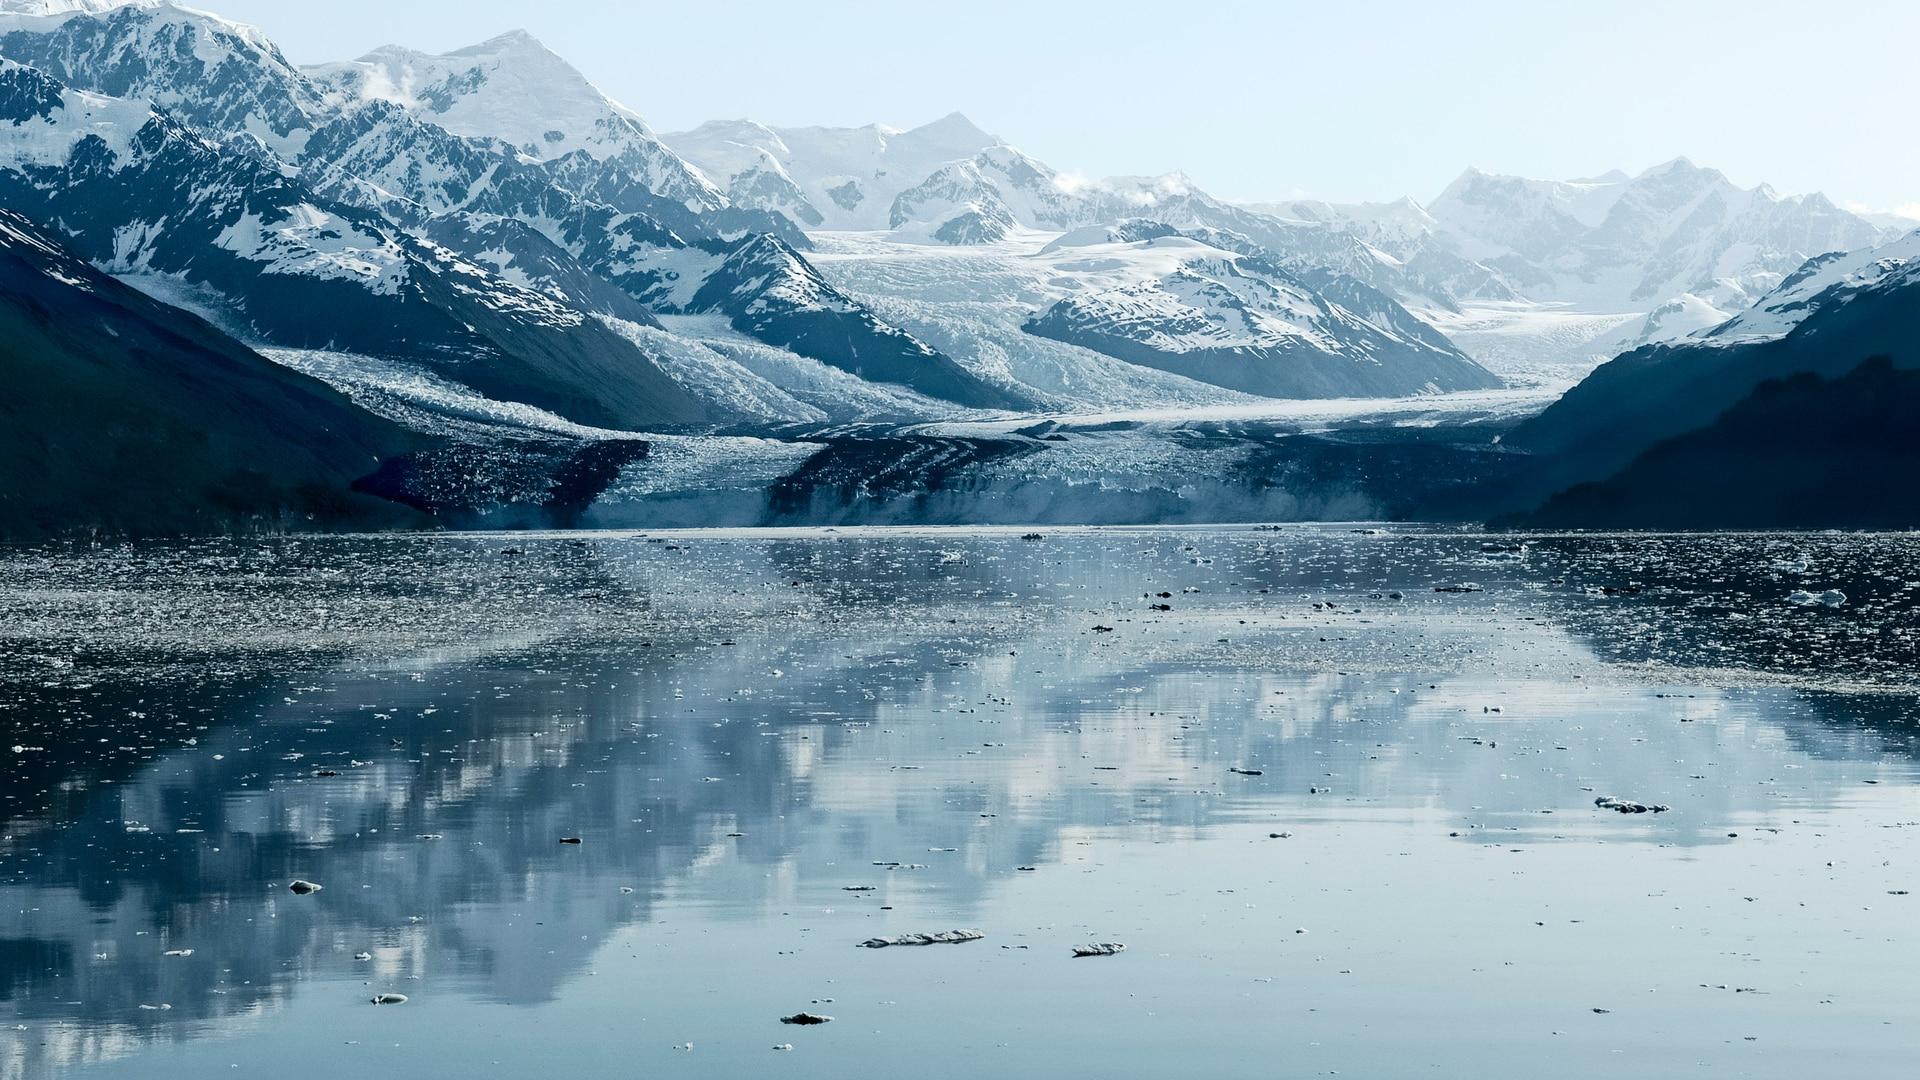 Harvard Glacier, College Fjord, Alaska